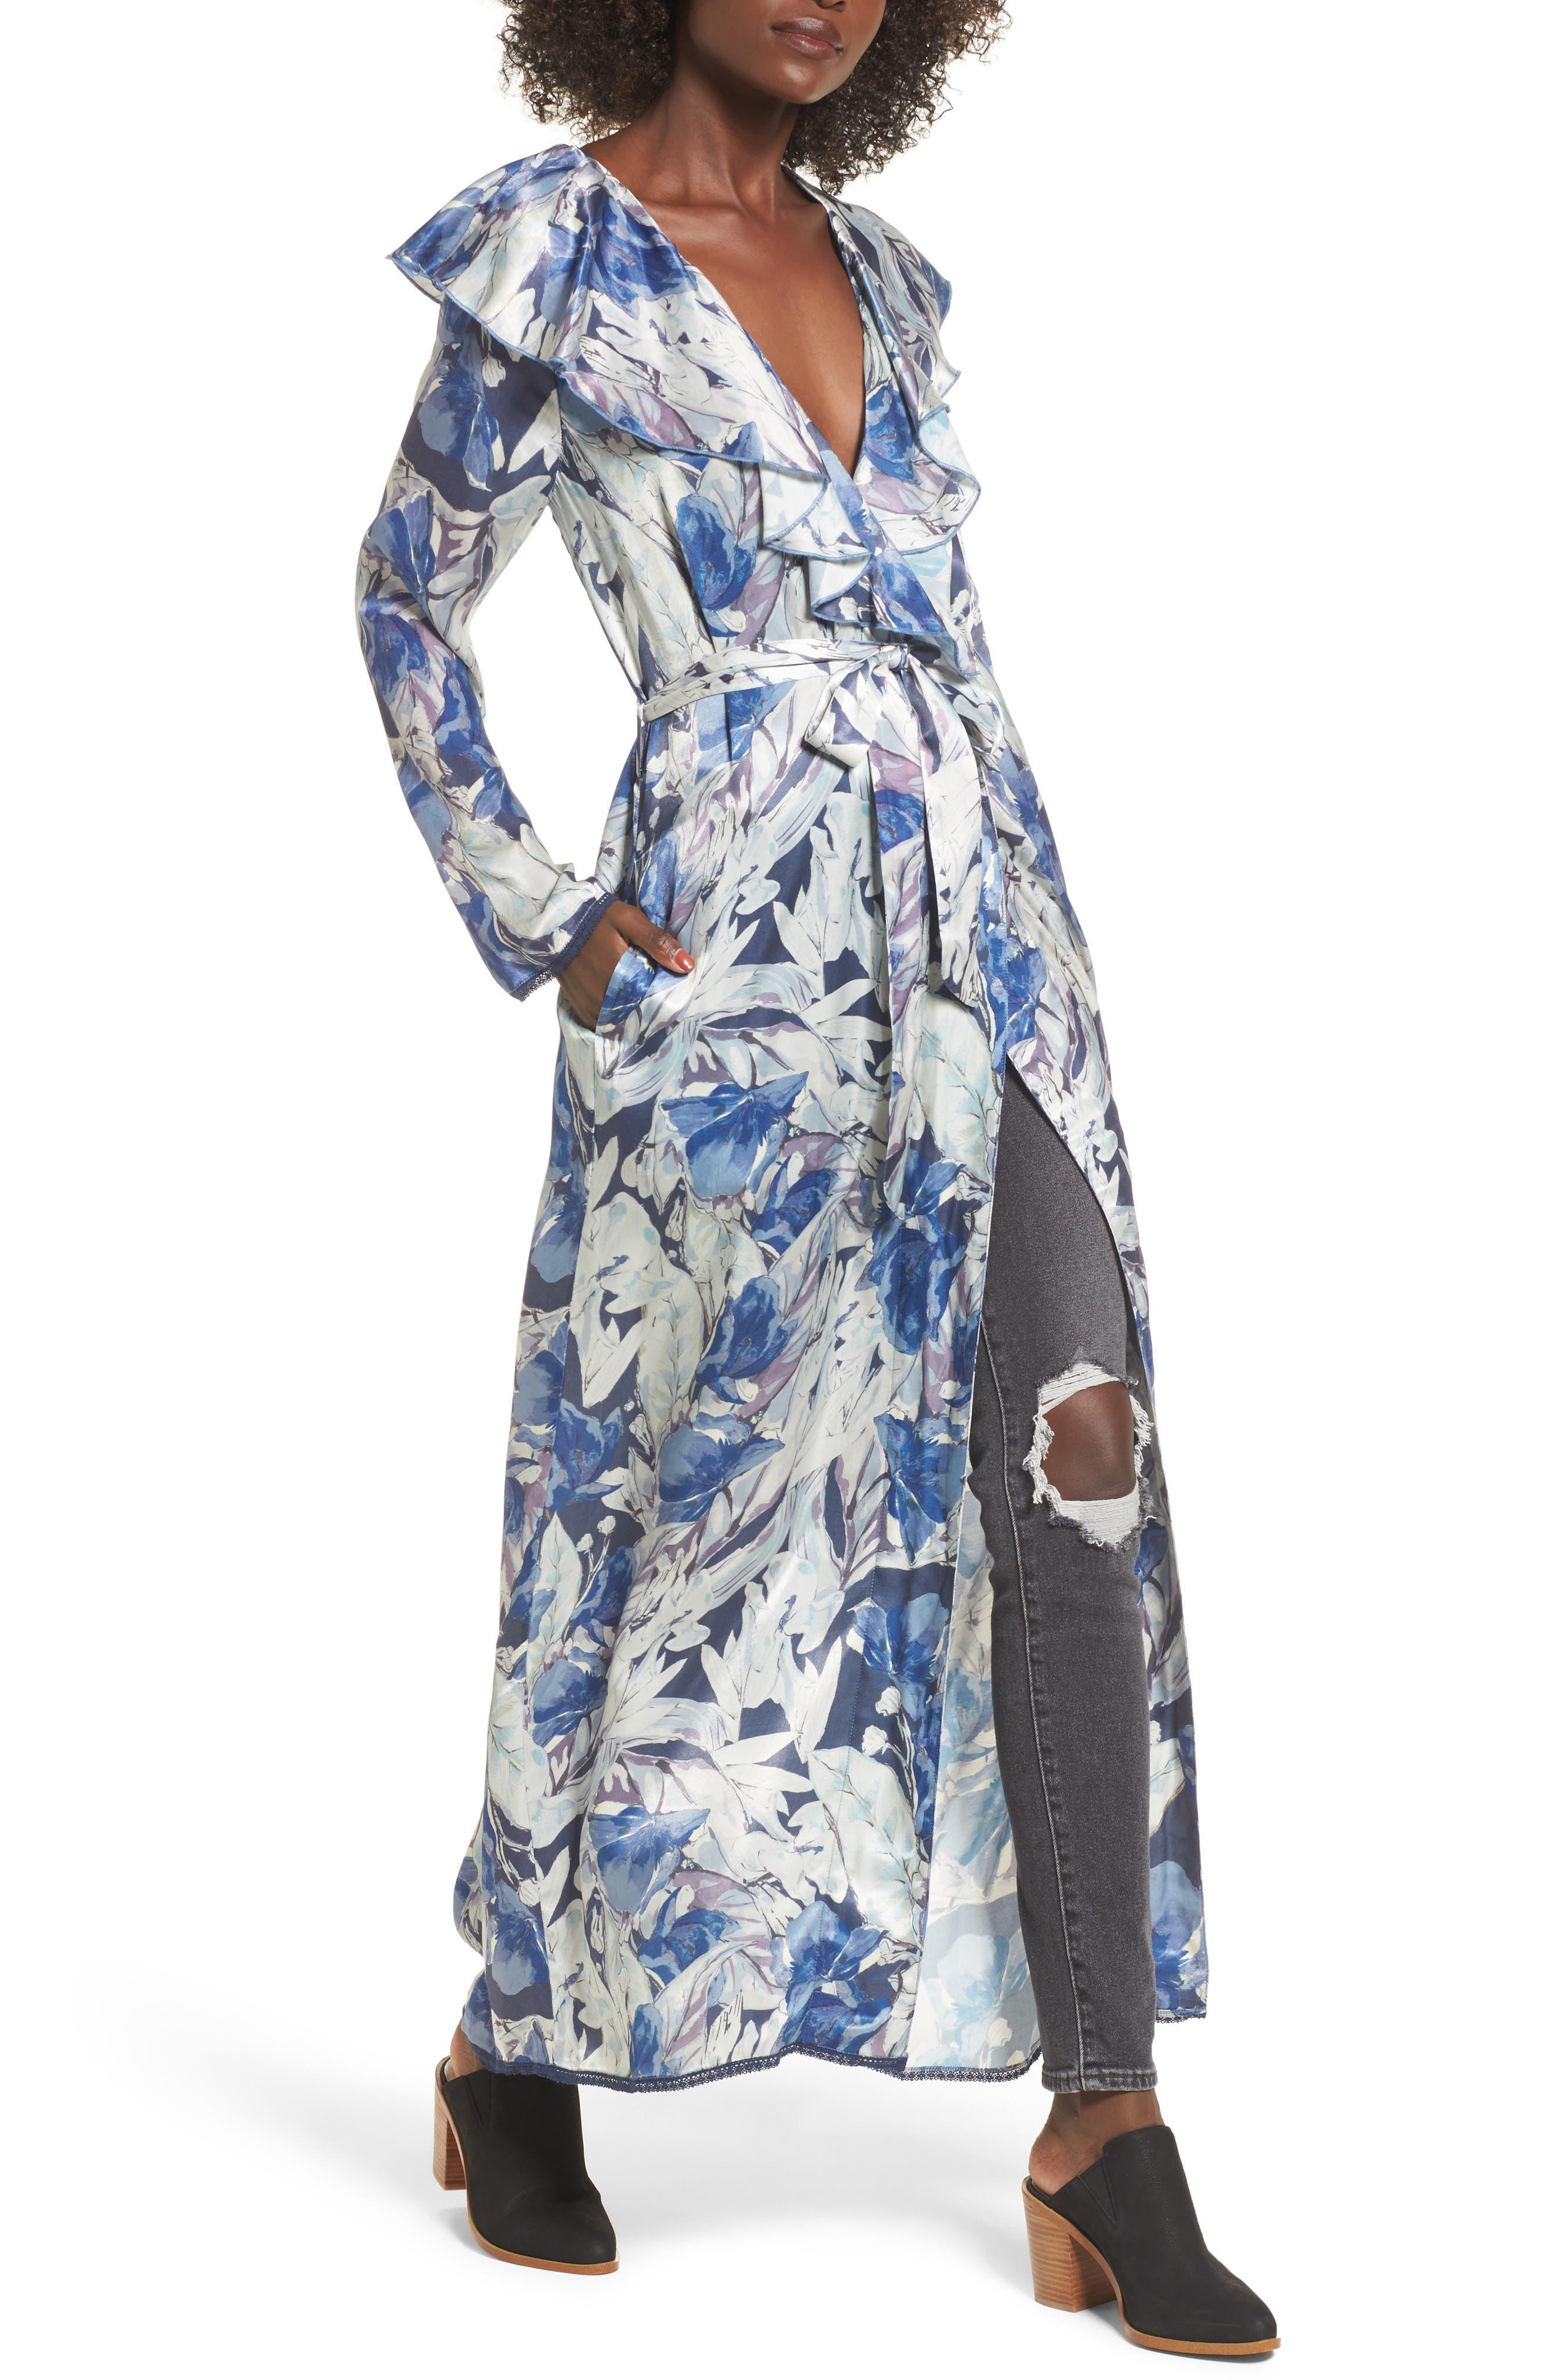 Drucilla Floral Print Duster,                         Main,                         color, 400